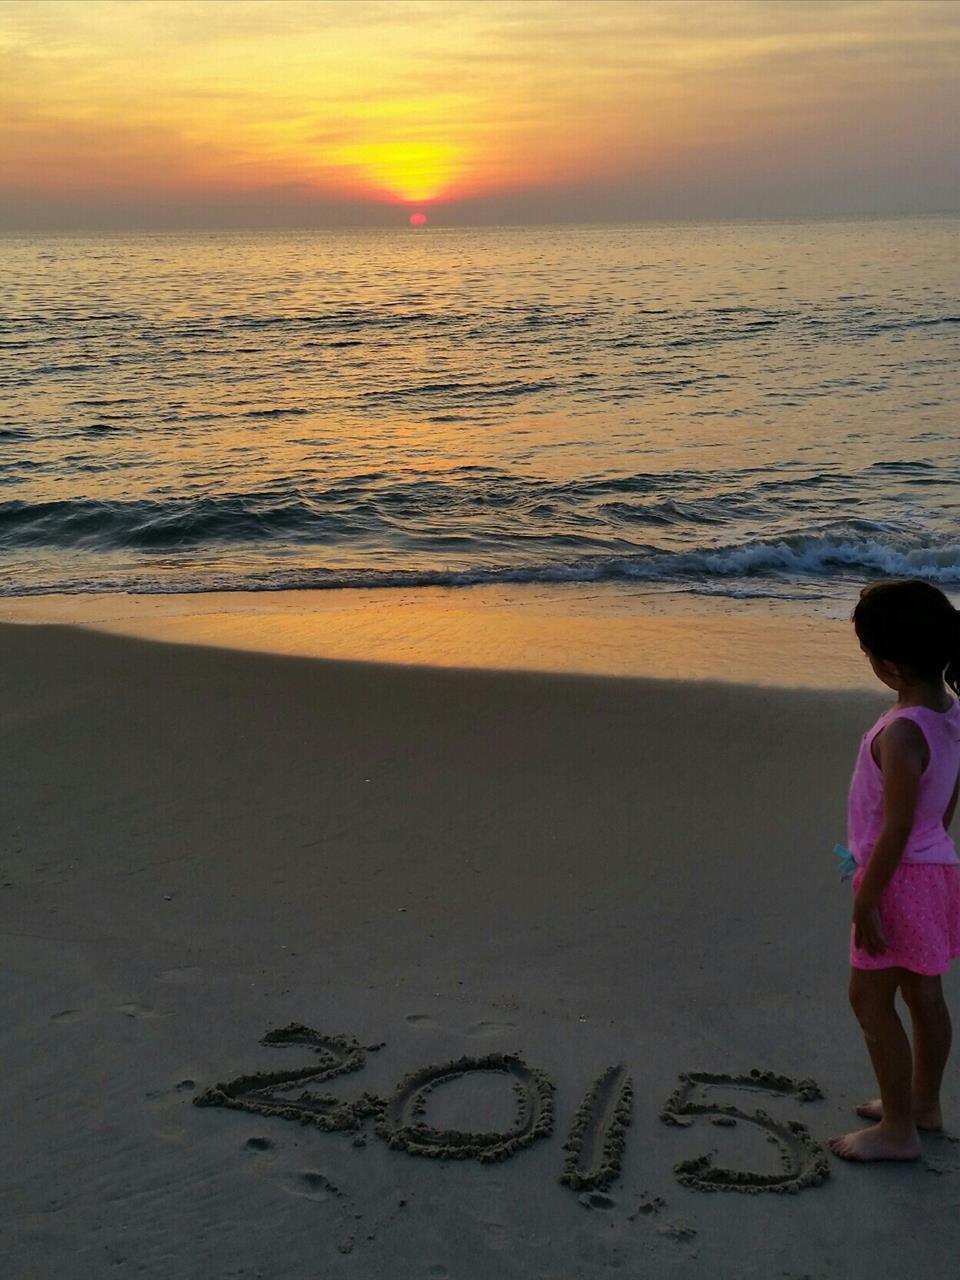 July 2015 Stay - JR248 - Sea & Sons, Heather Work